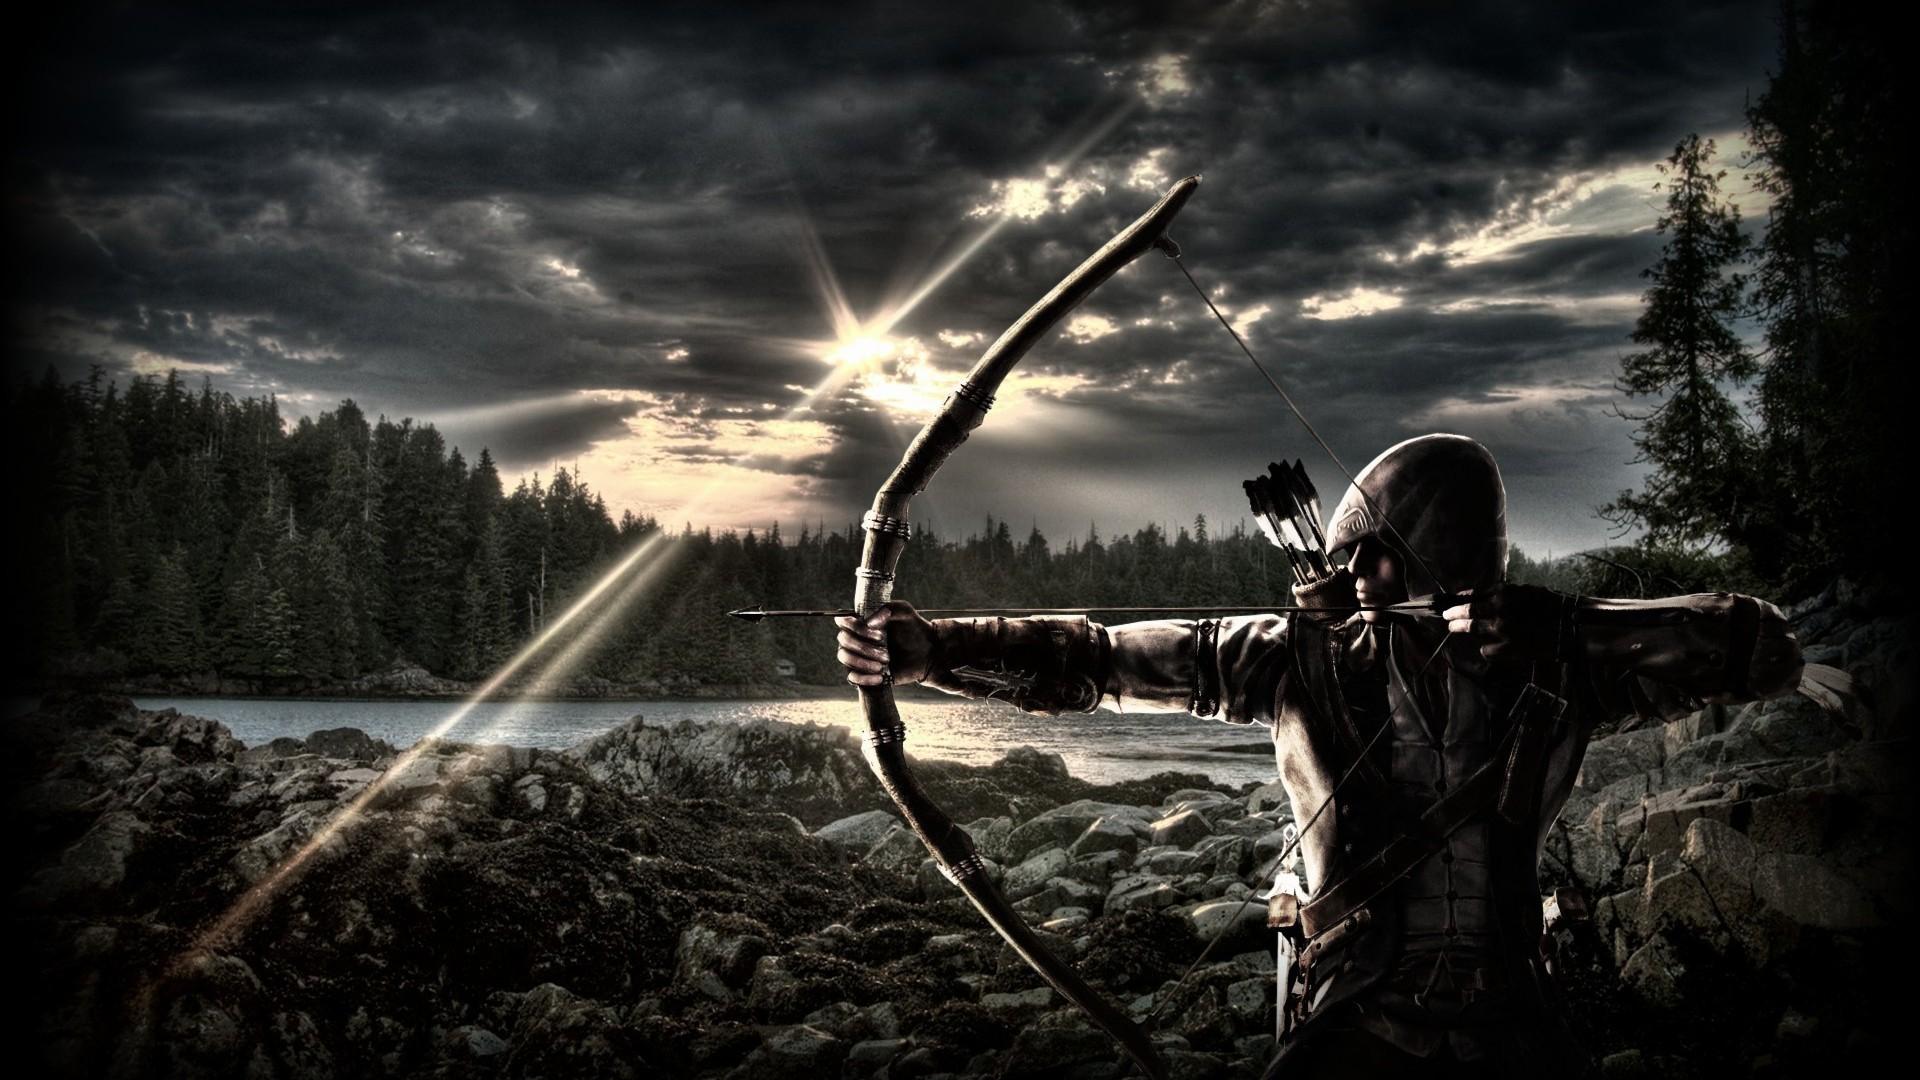 Assassins Creed 3 Wallpaper 1920x1080 (80+ Images